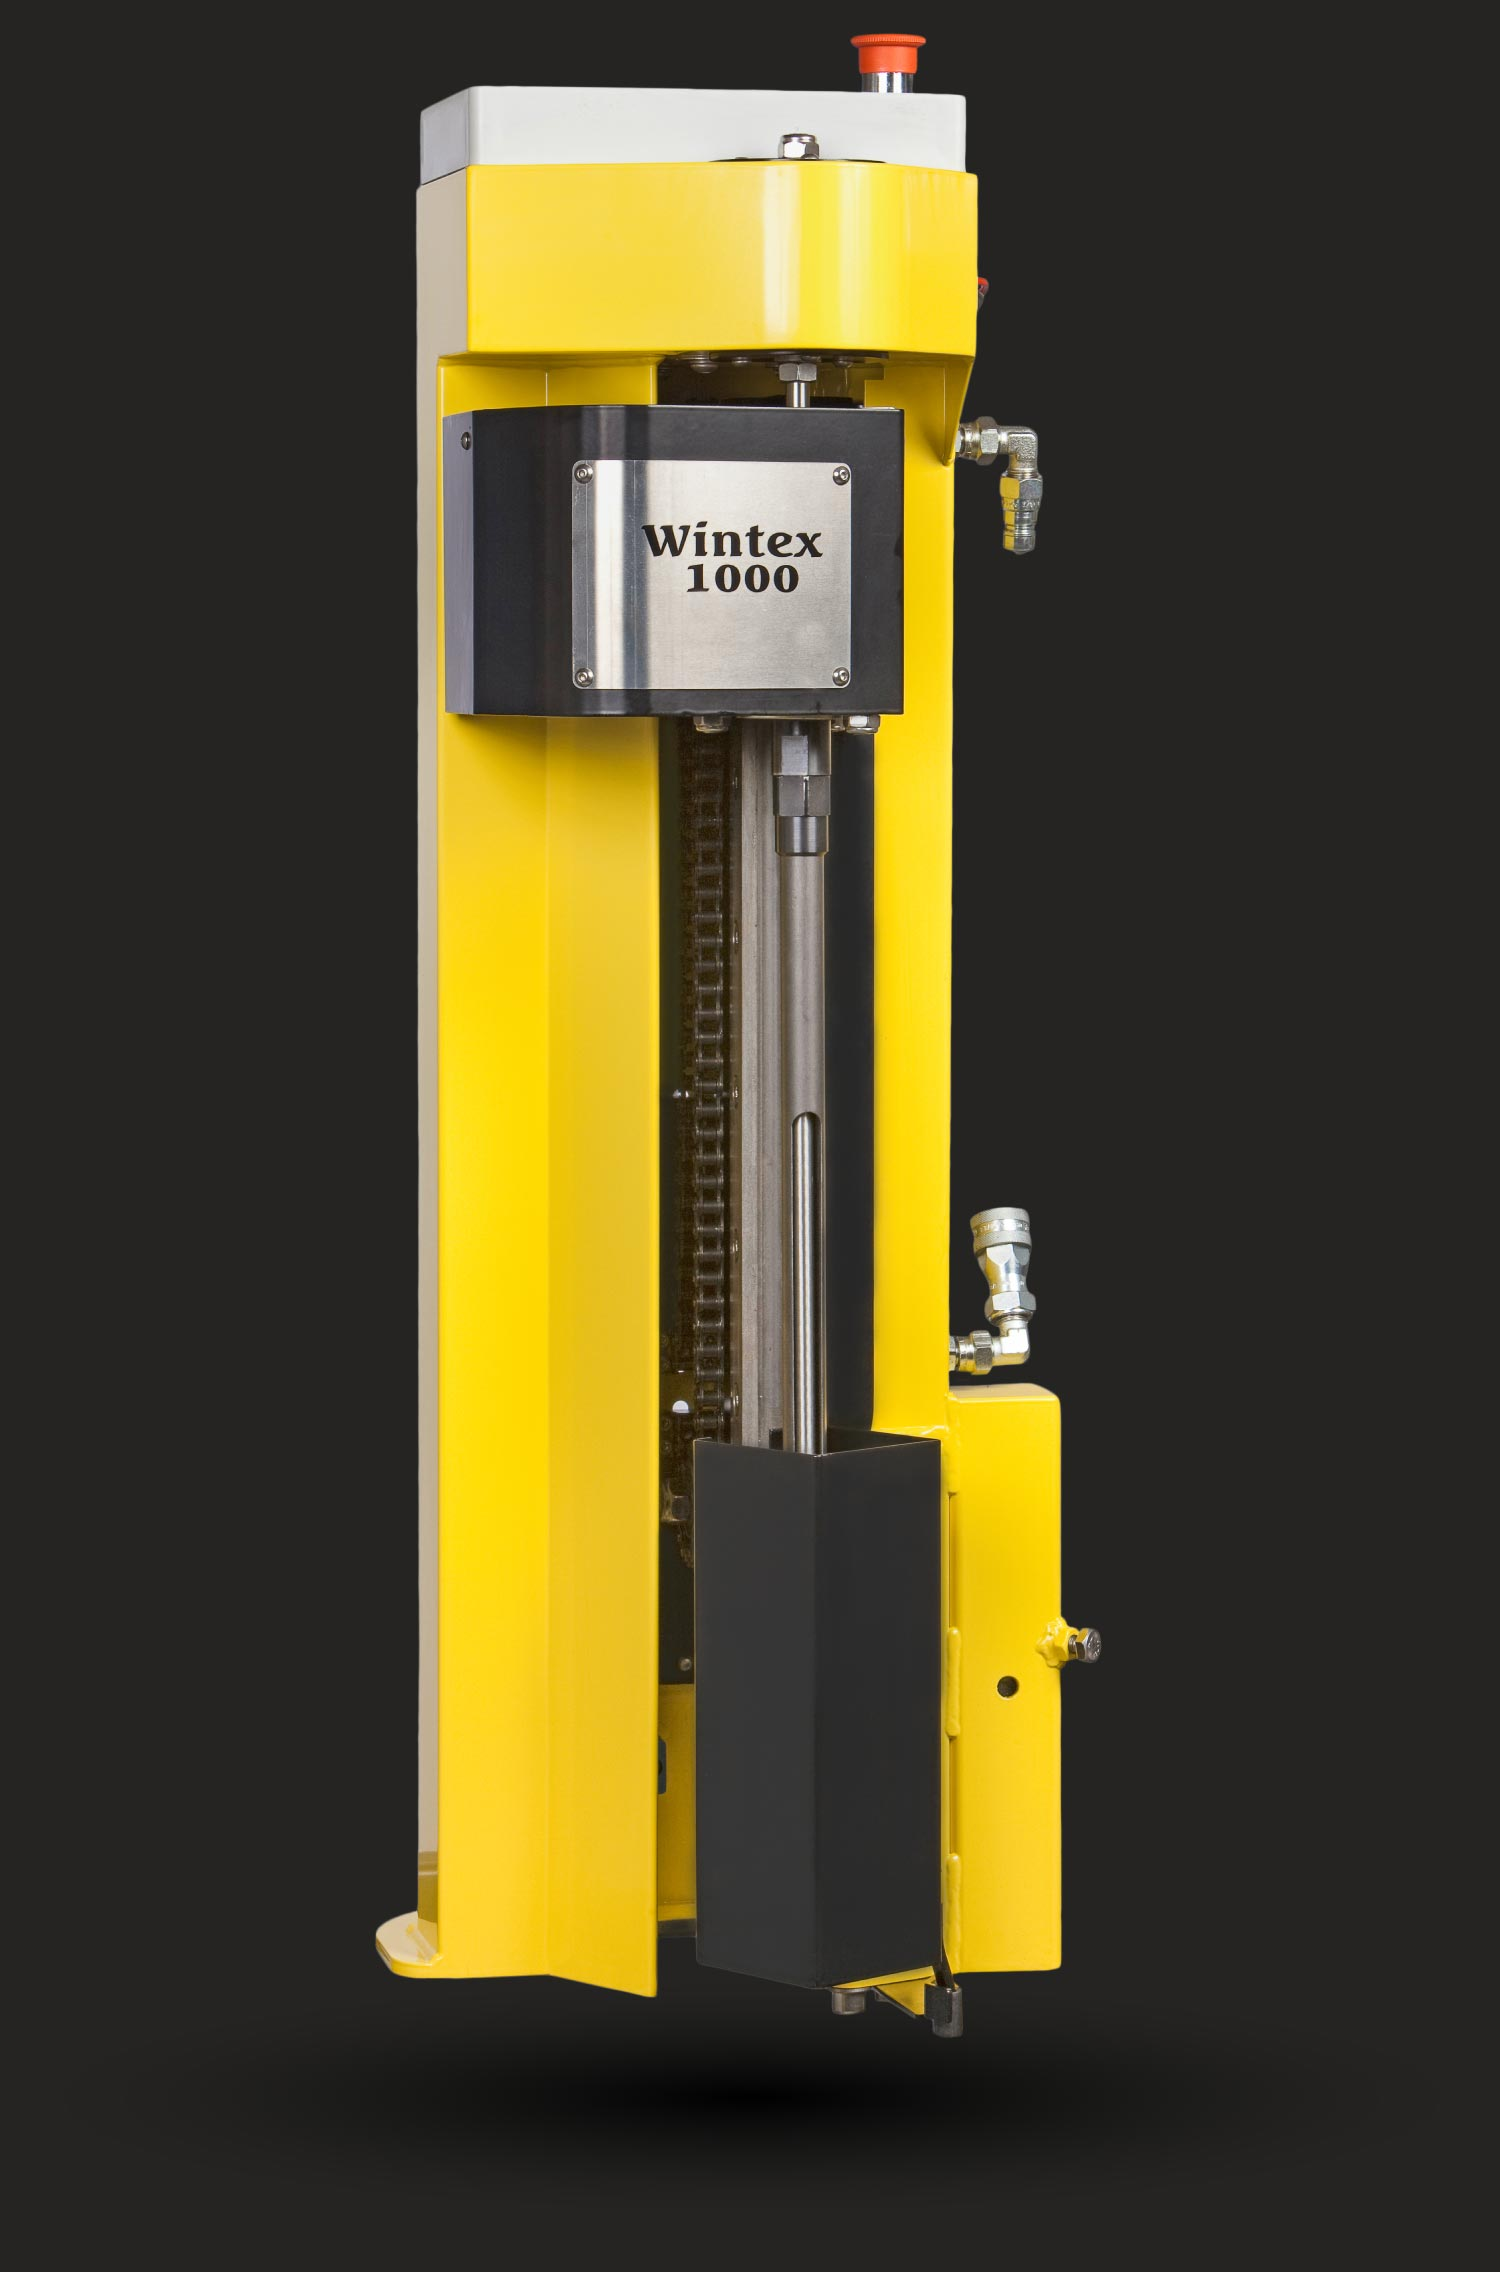 Wintex 1000 automatic soil sampler